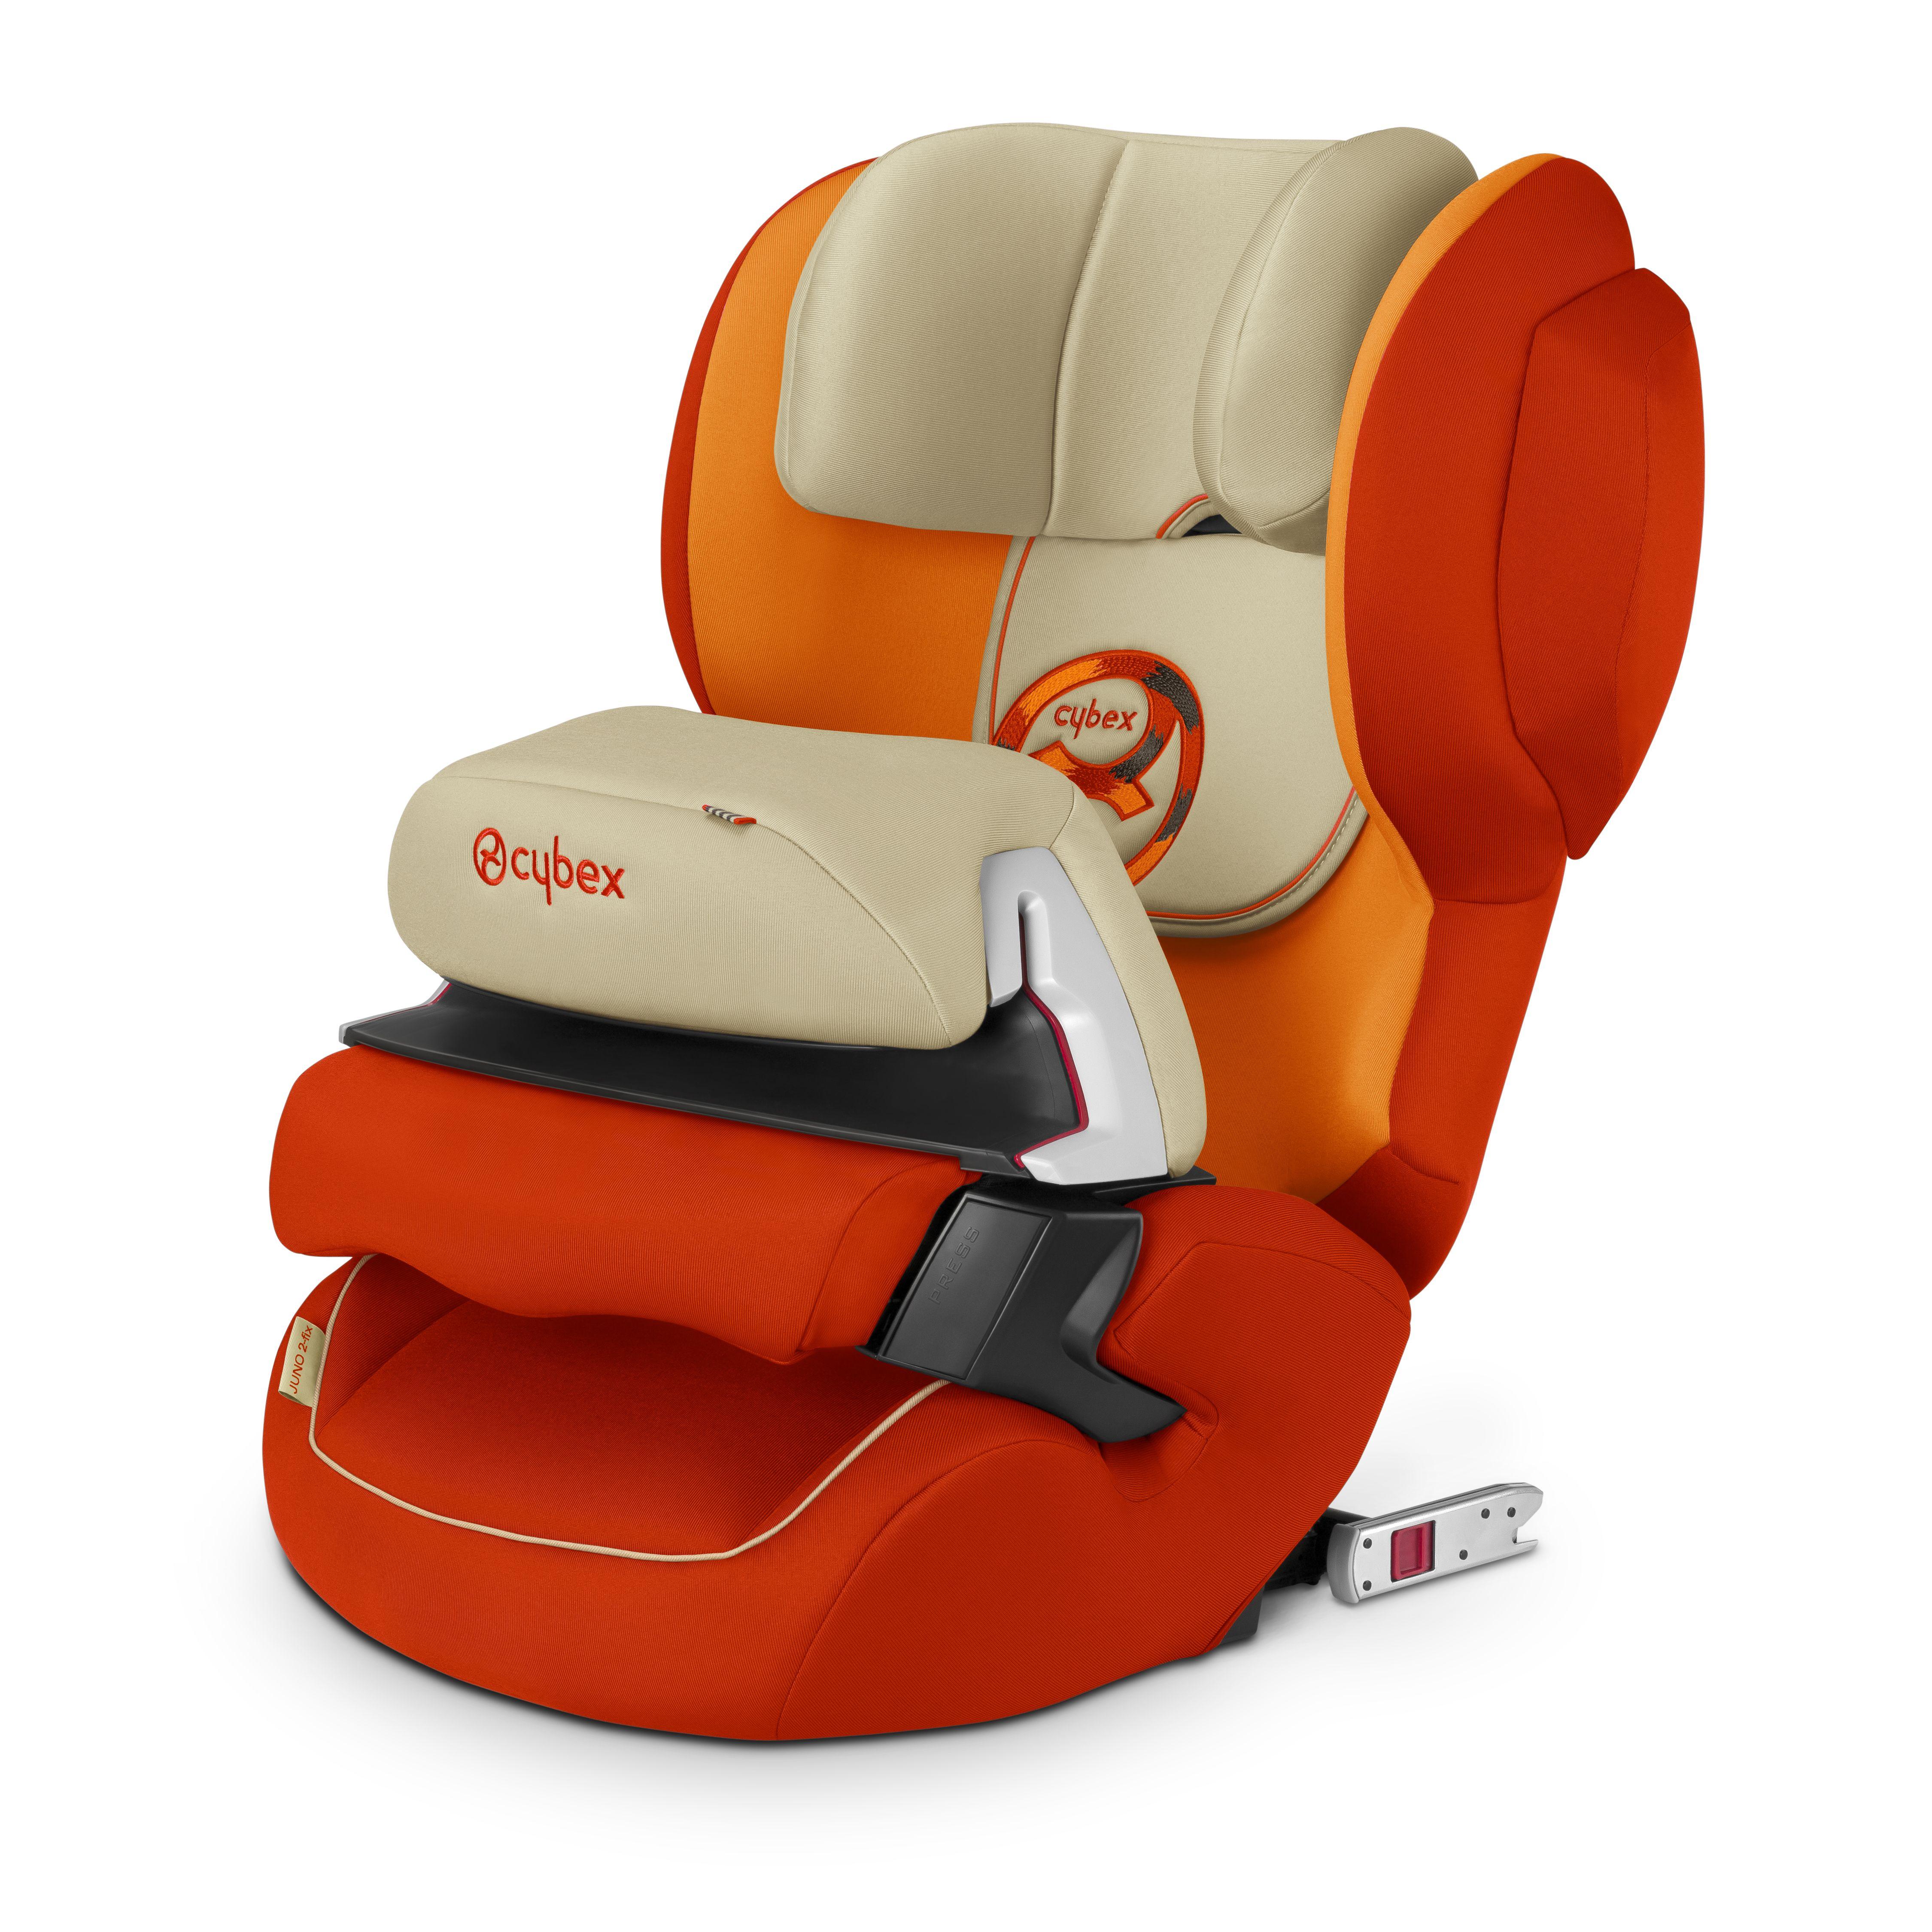 Cybex Juno 2 Fix Autumn Gold Car Seats Child Car Seat Baby Car Seats